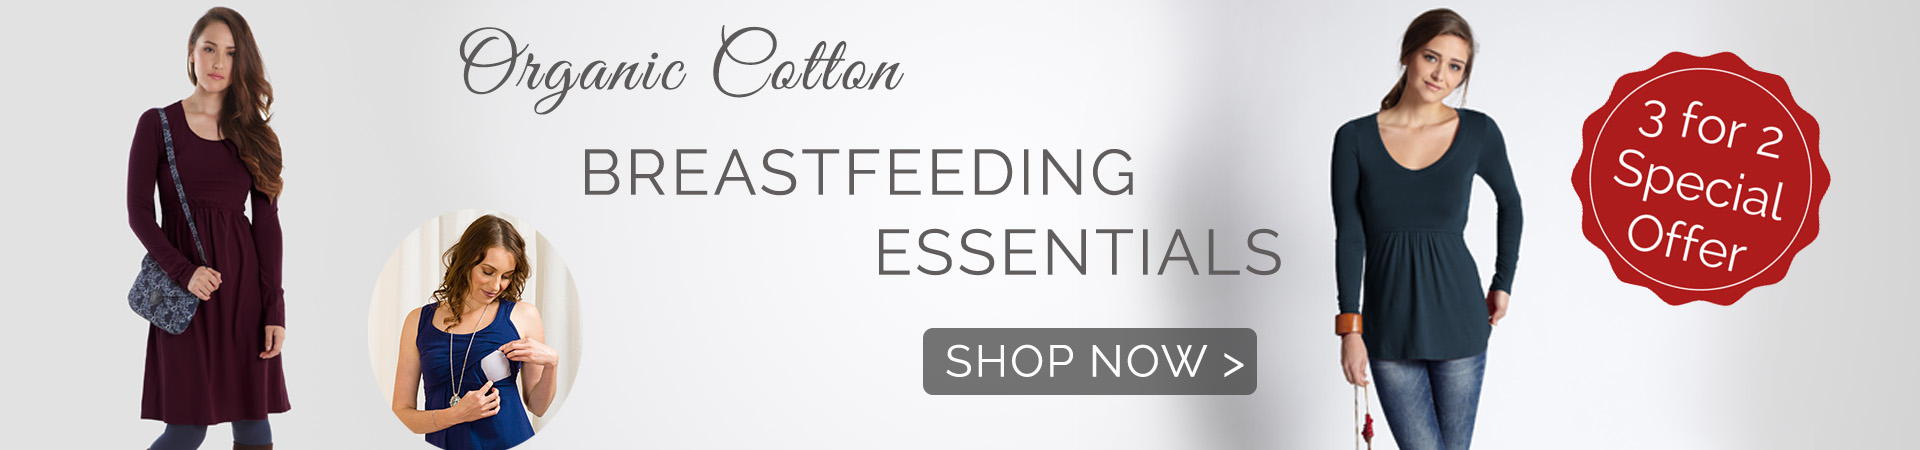 Organic Breastfeeding Essentials